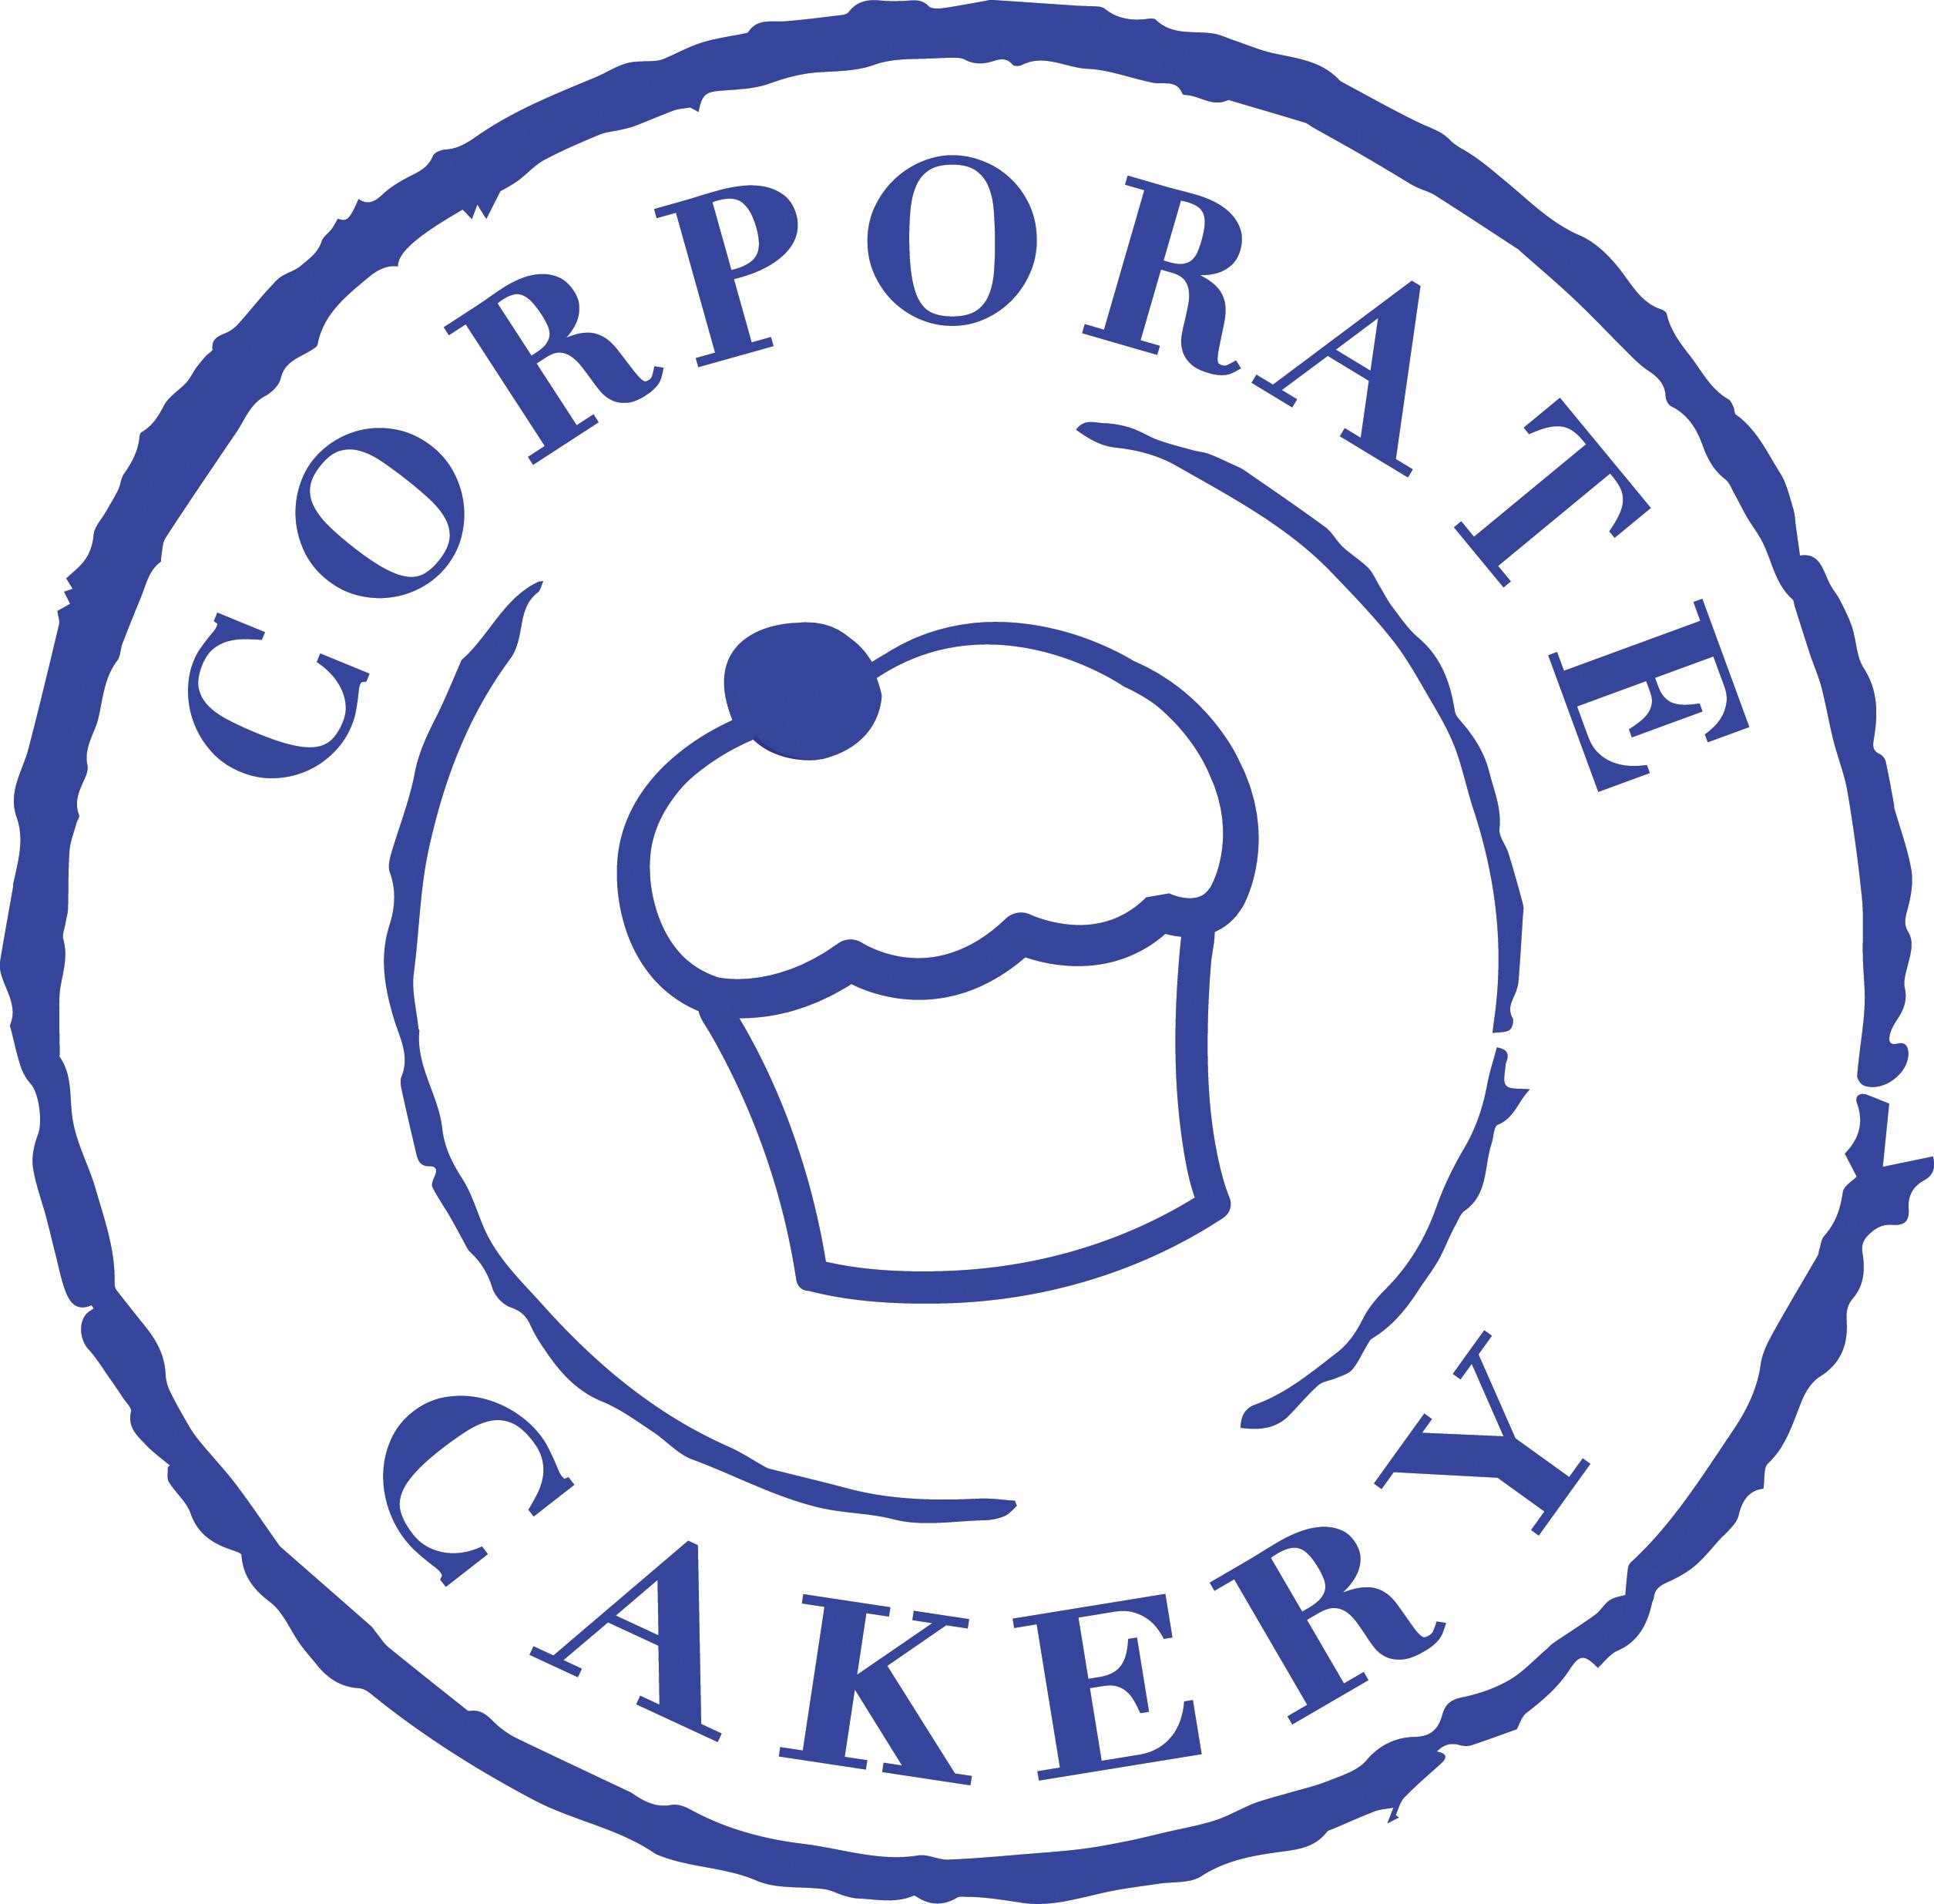 Corporate cakery swindon corporate cupcakes delivered swindon corporate cakery ltd biocorpaavc Gallery